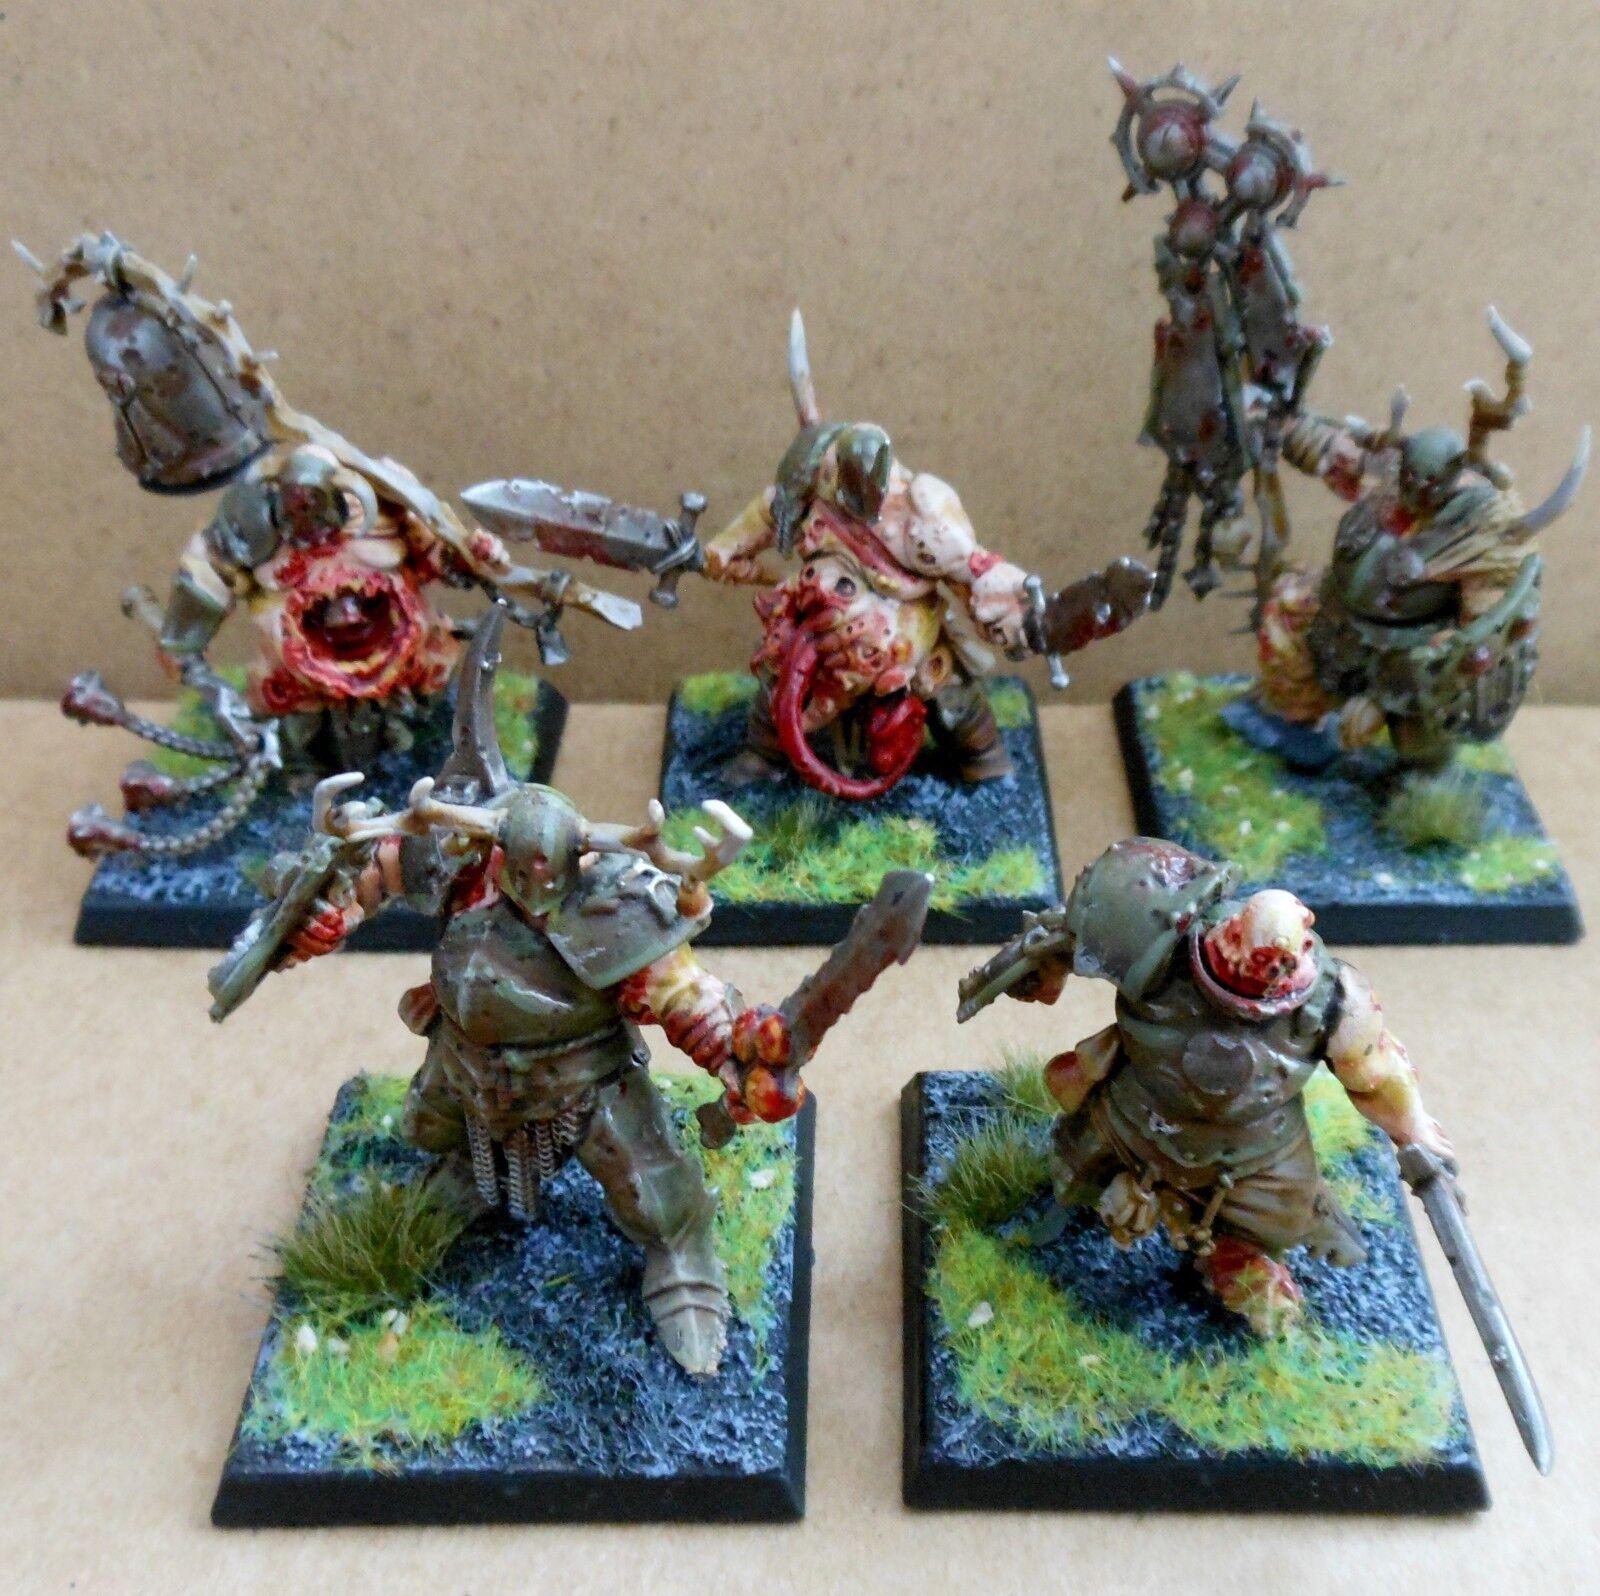 2013 caos Nurgle Putrid Blightkings ciudadela Pro pintado warhammer blightlord GW